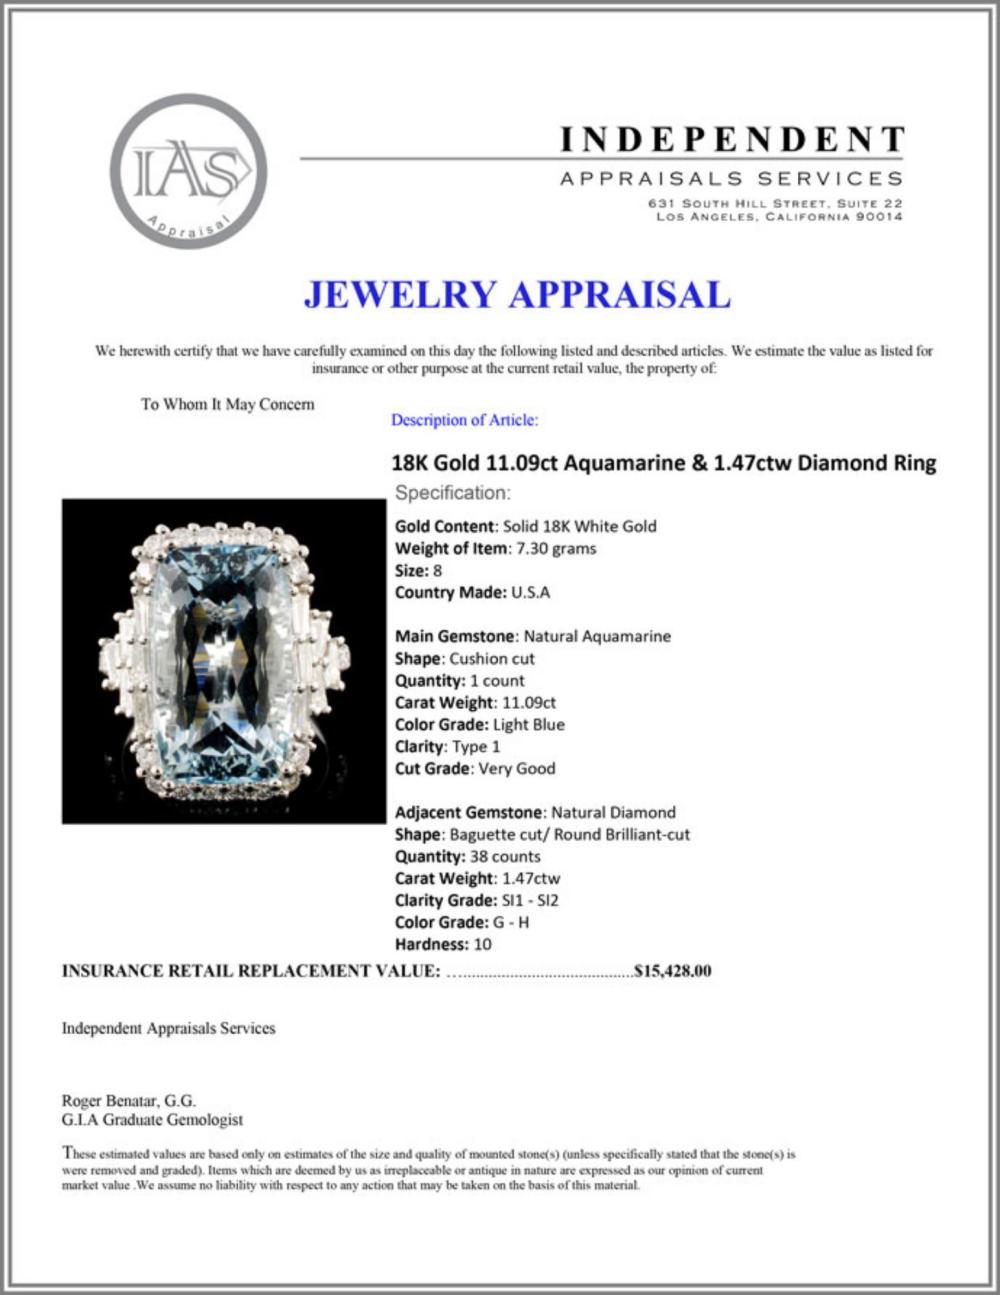 Lot 197: 18K Gold 11.09ct Aquamarine & 1.47ctw Diamond Ring